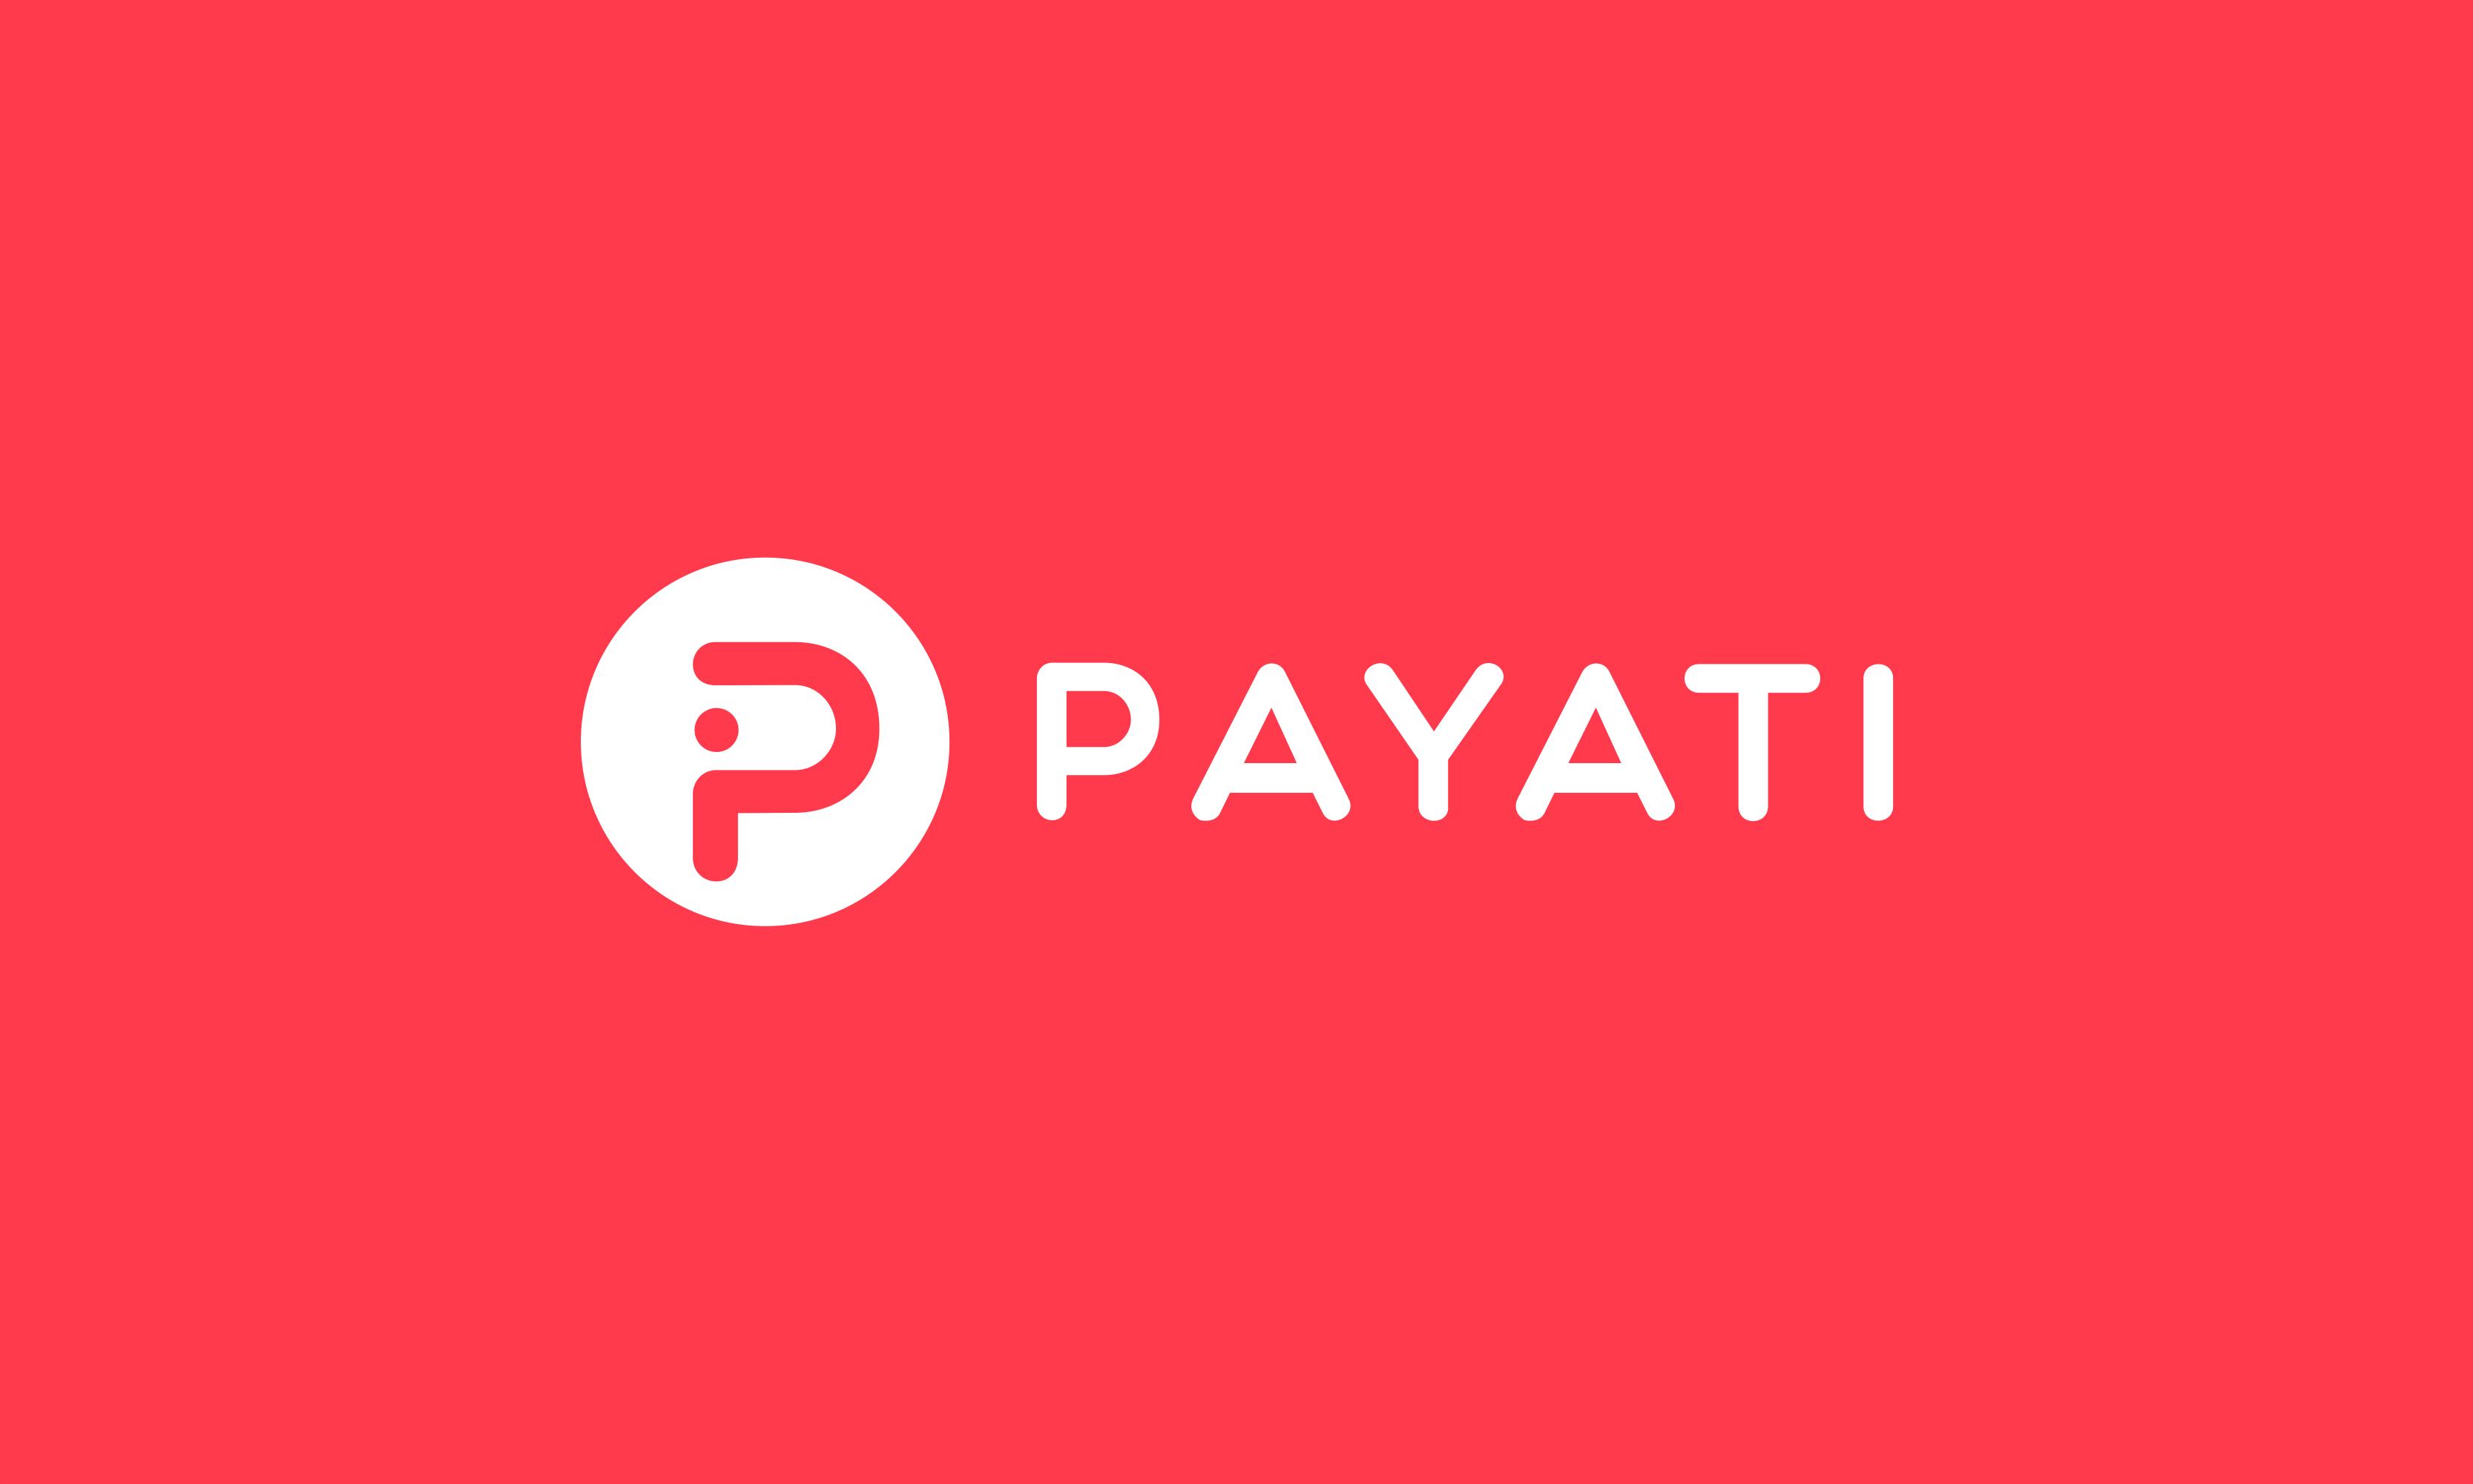 Payati